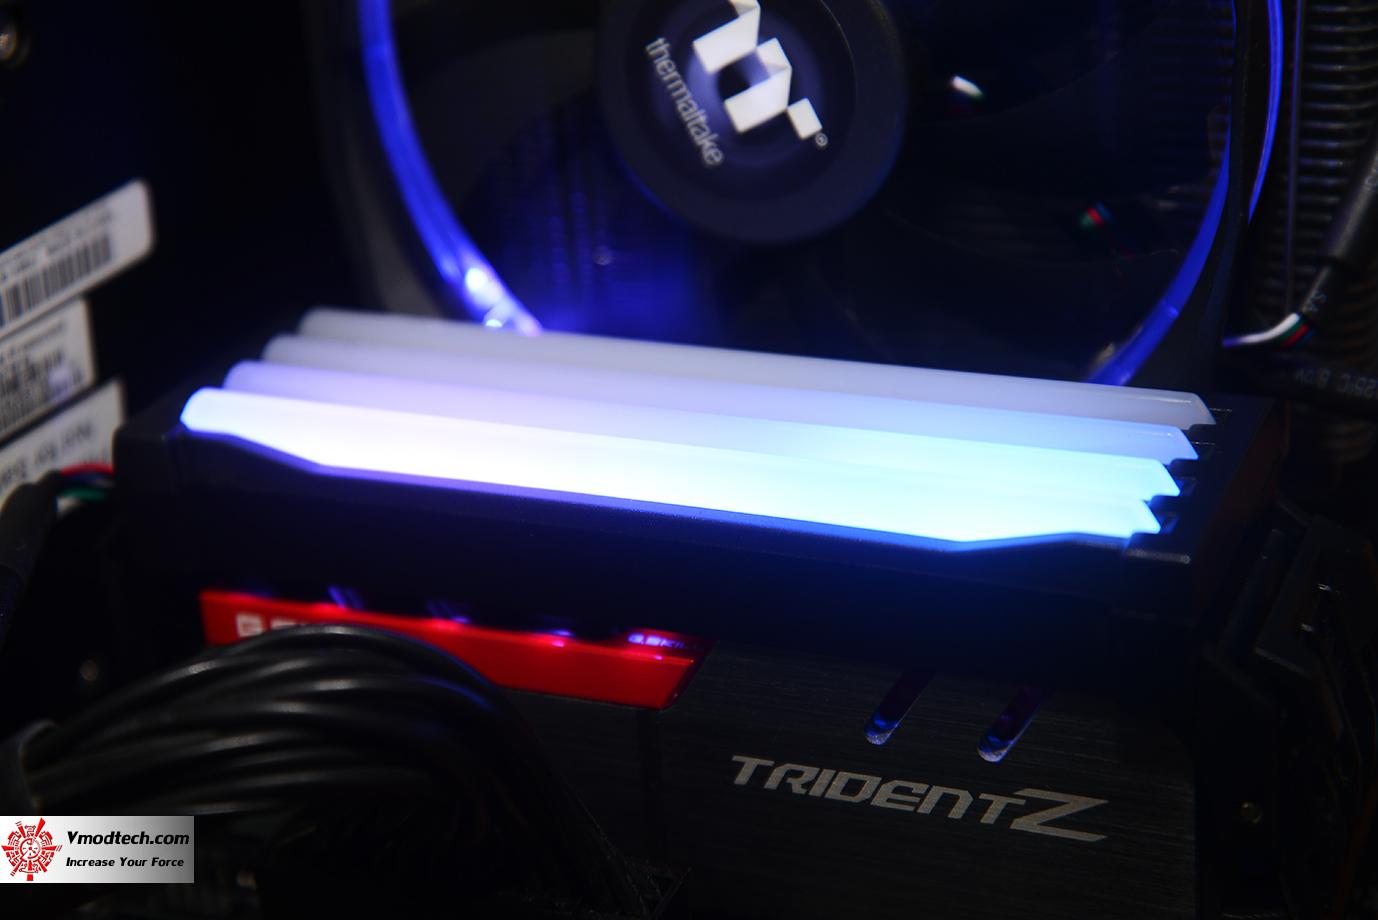 dsc 5592 Thermaltake Pacific R1 Plus DDR4 Memory Lighting Kit Review